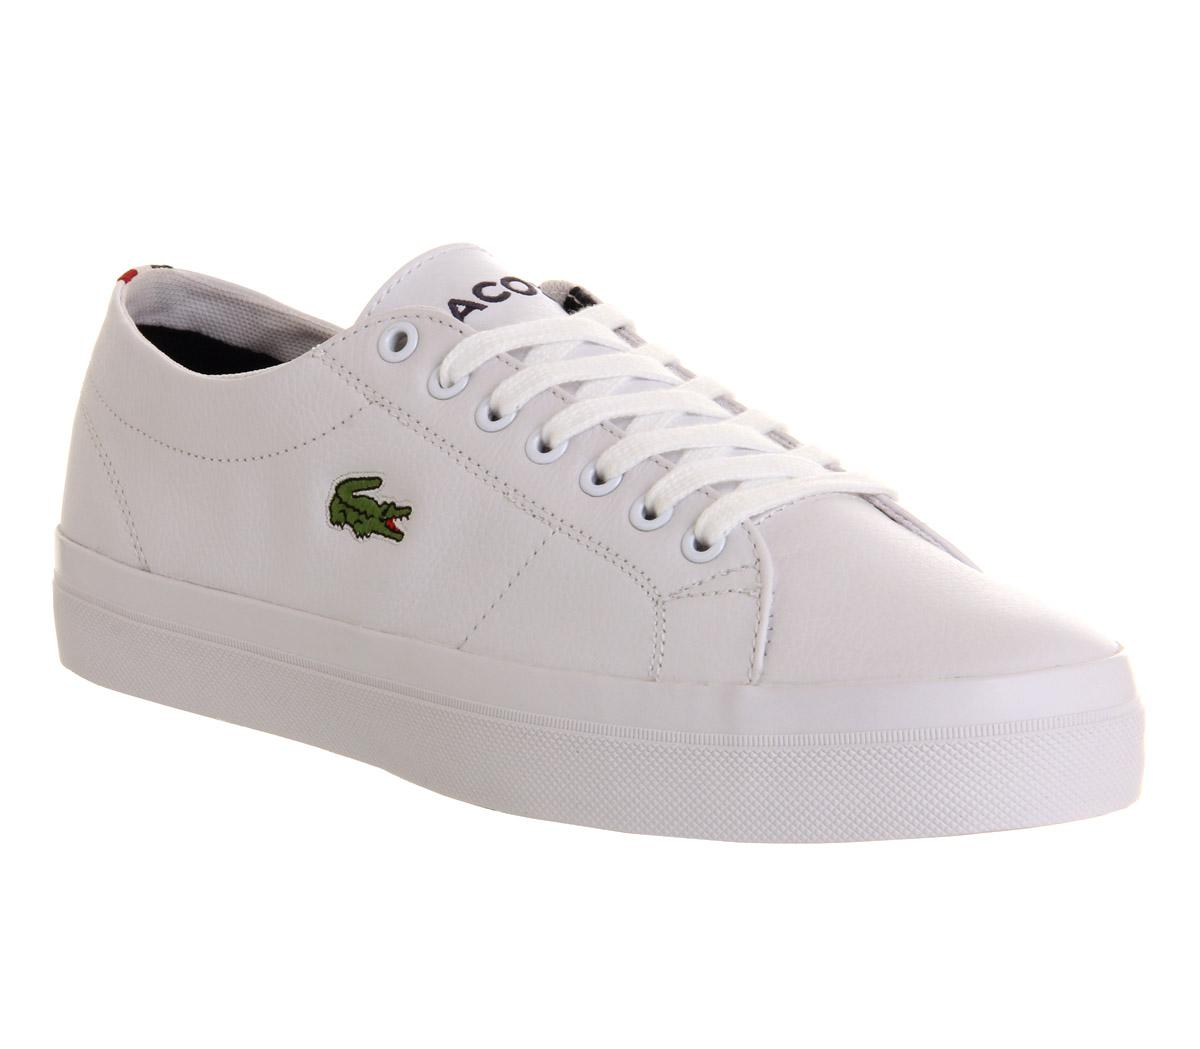 eaf433d09 Lyst - Lacoste Marcel in White for Men